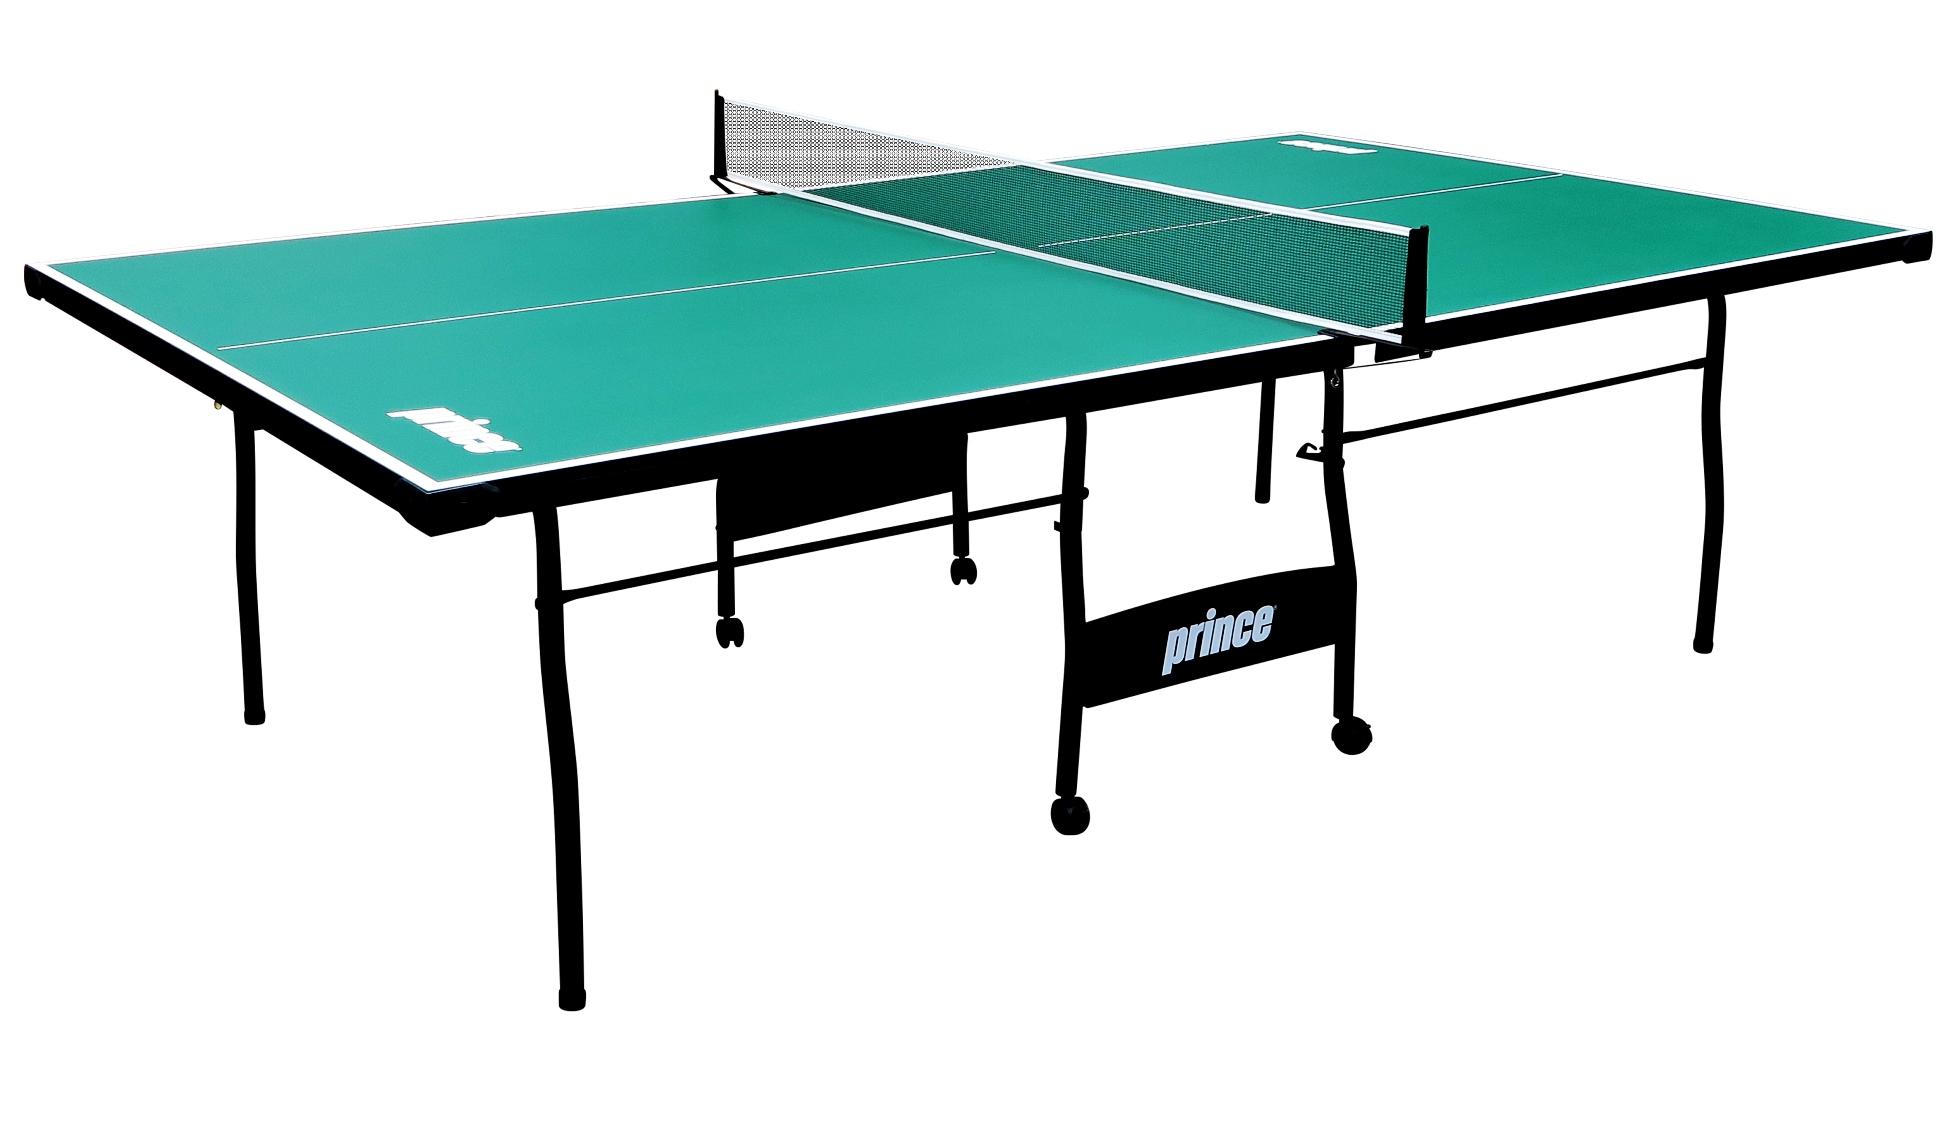 Table tennis dimensions